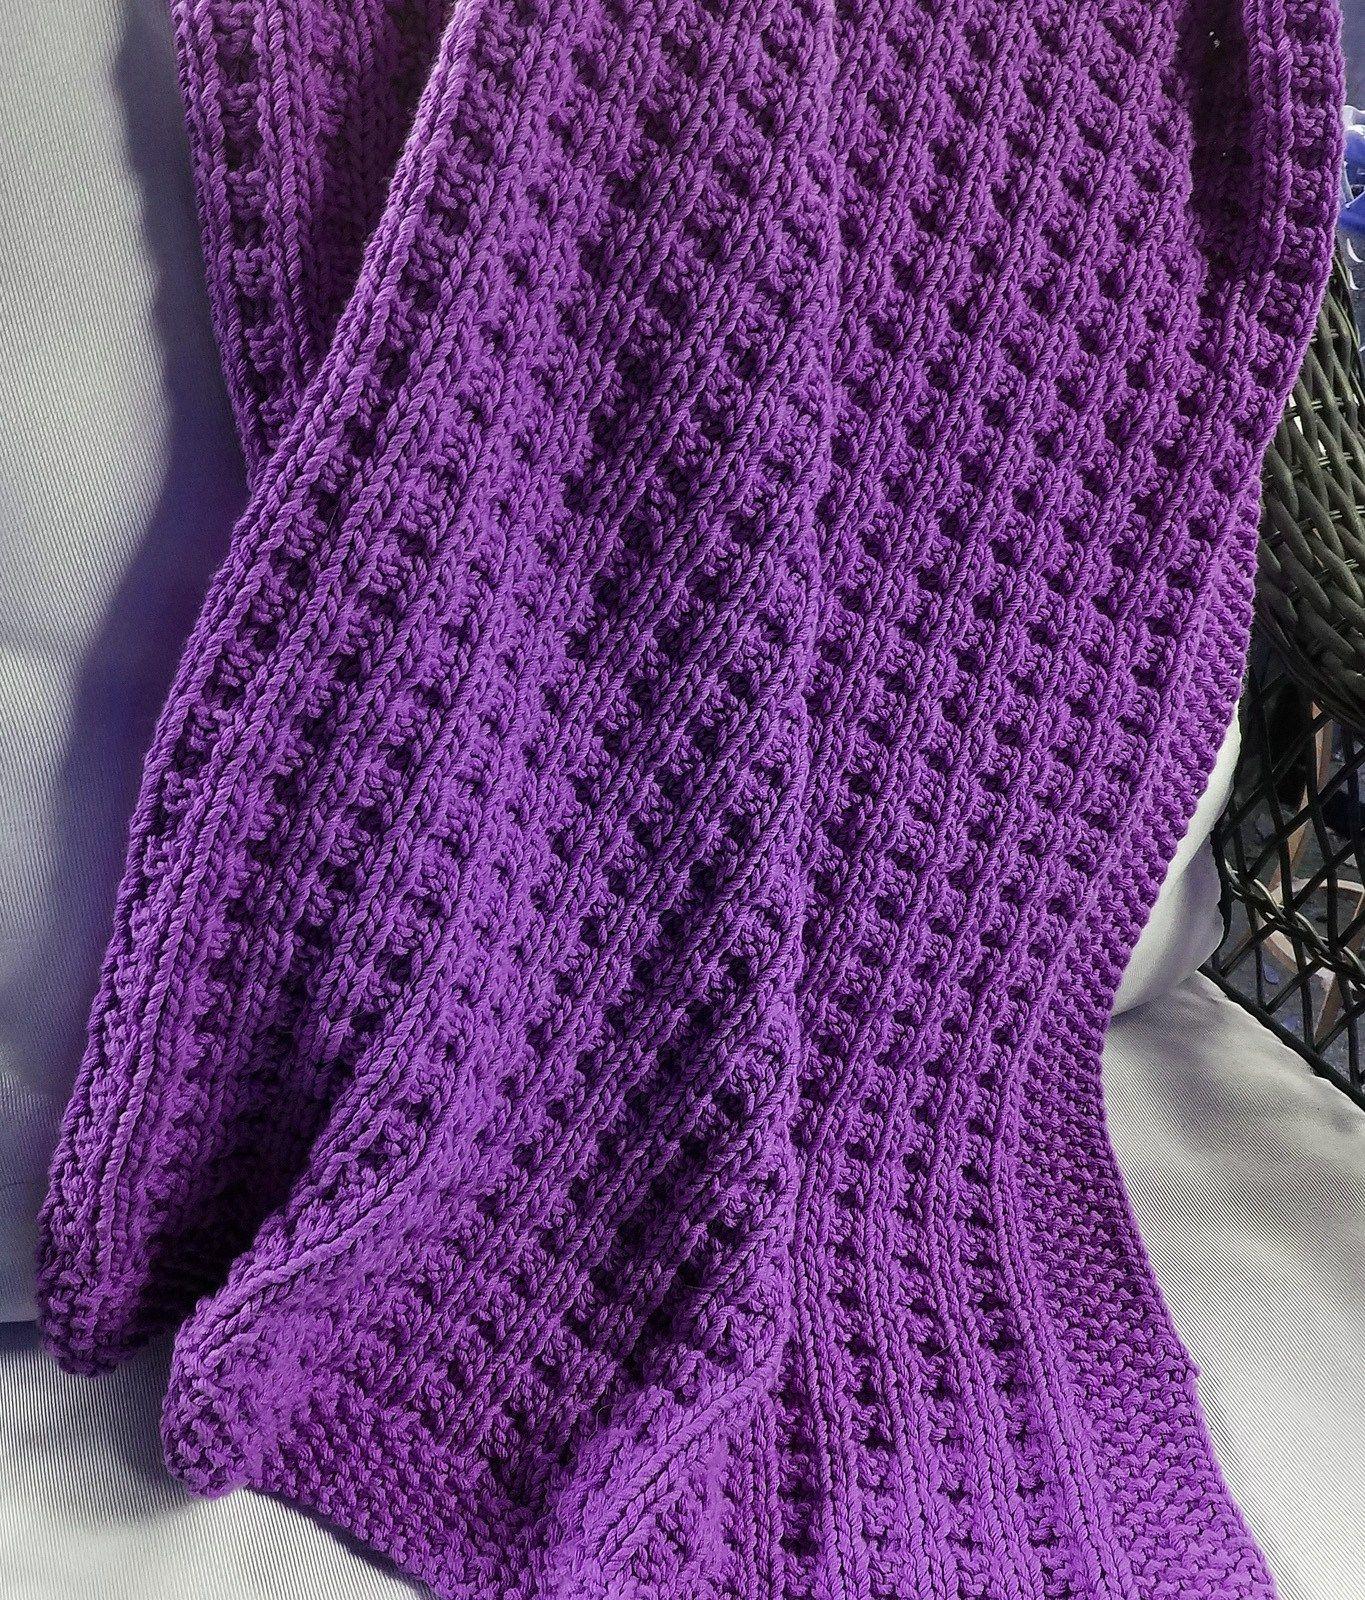 Free Knitting Pattern for Cuddly Baby Blanket -Sarah Keller\'s easy ...